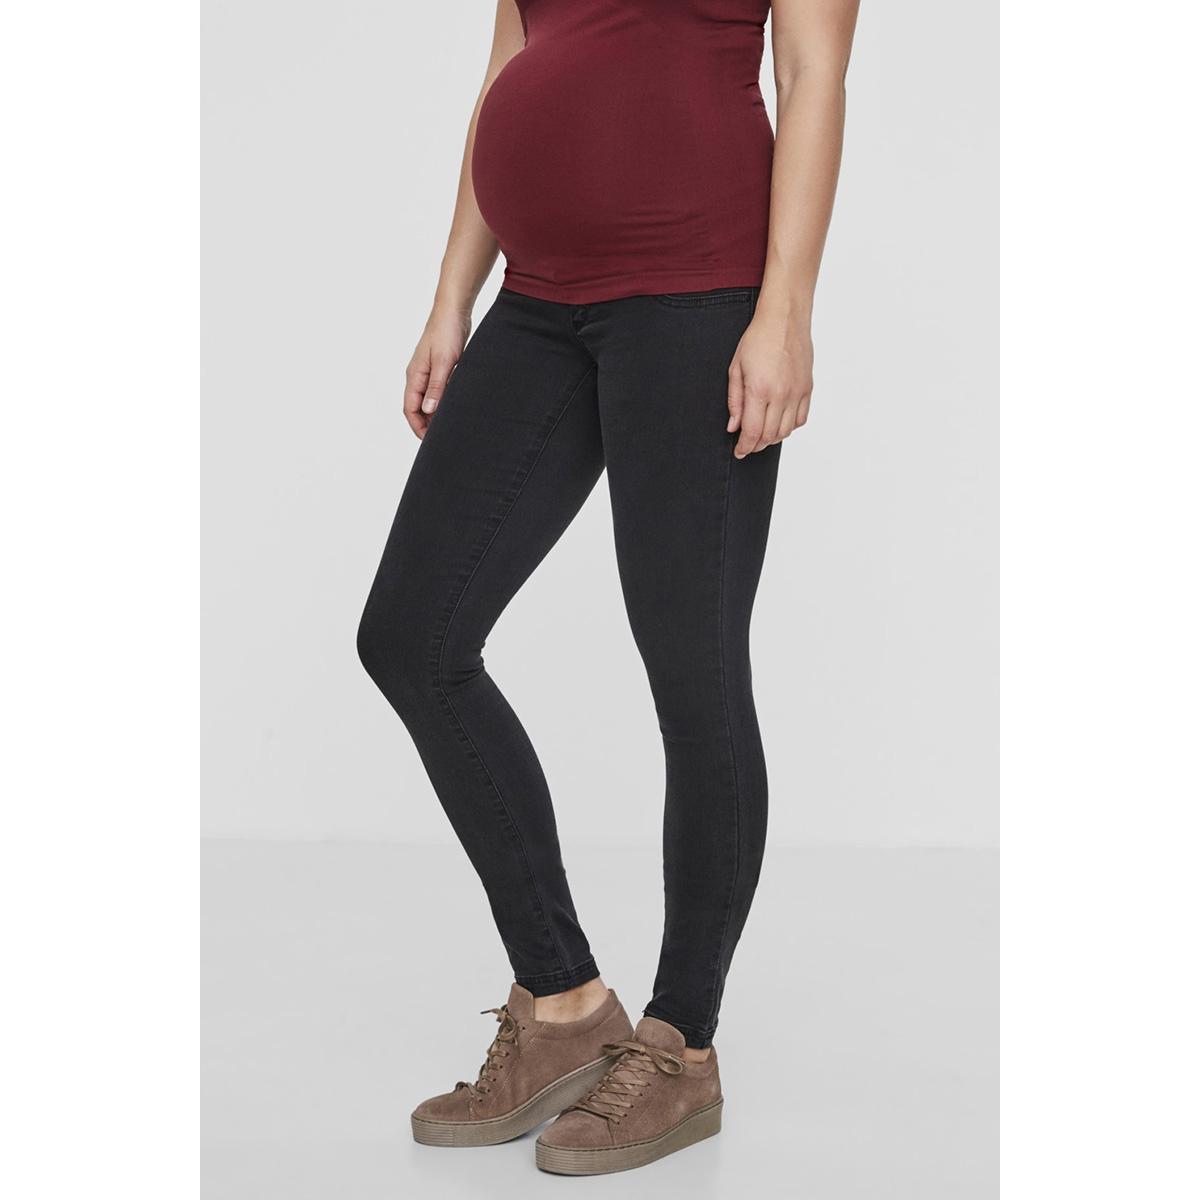 mlella skinny dark grey jeans 20006708 mama-licious positie broek dark grey denim